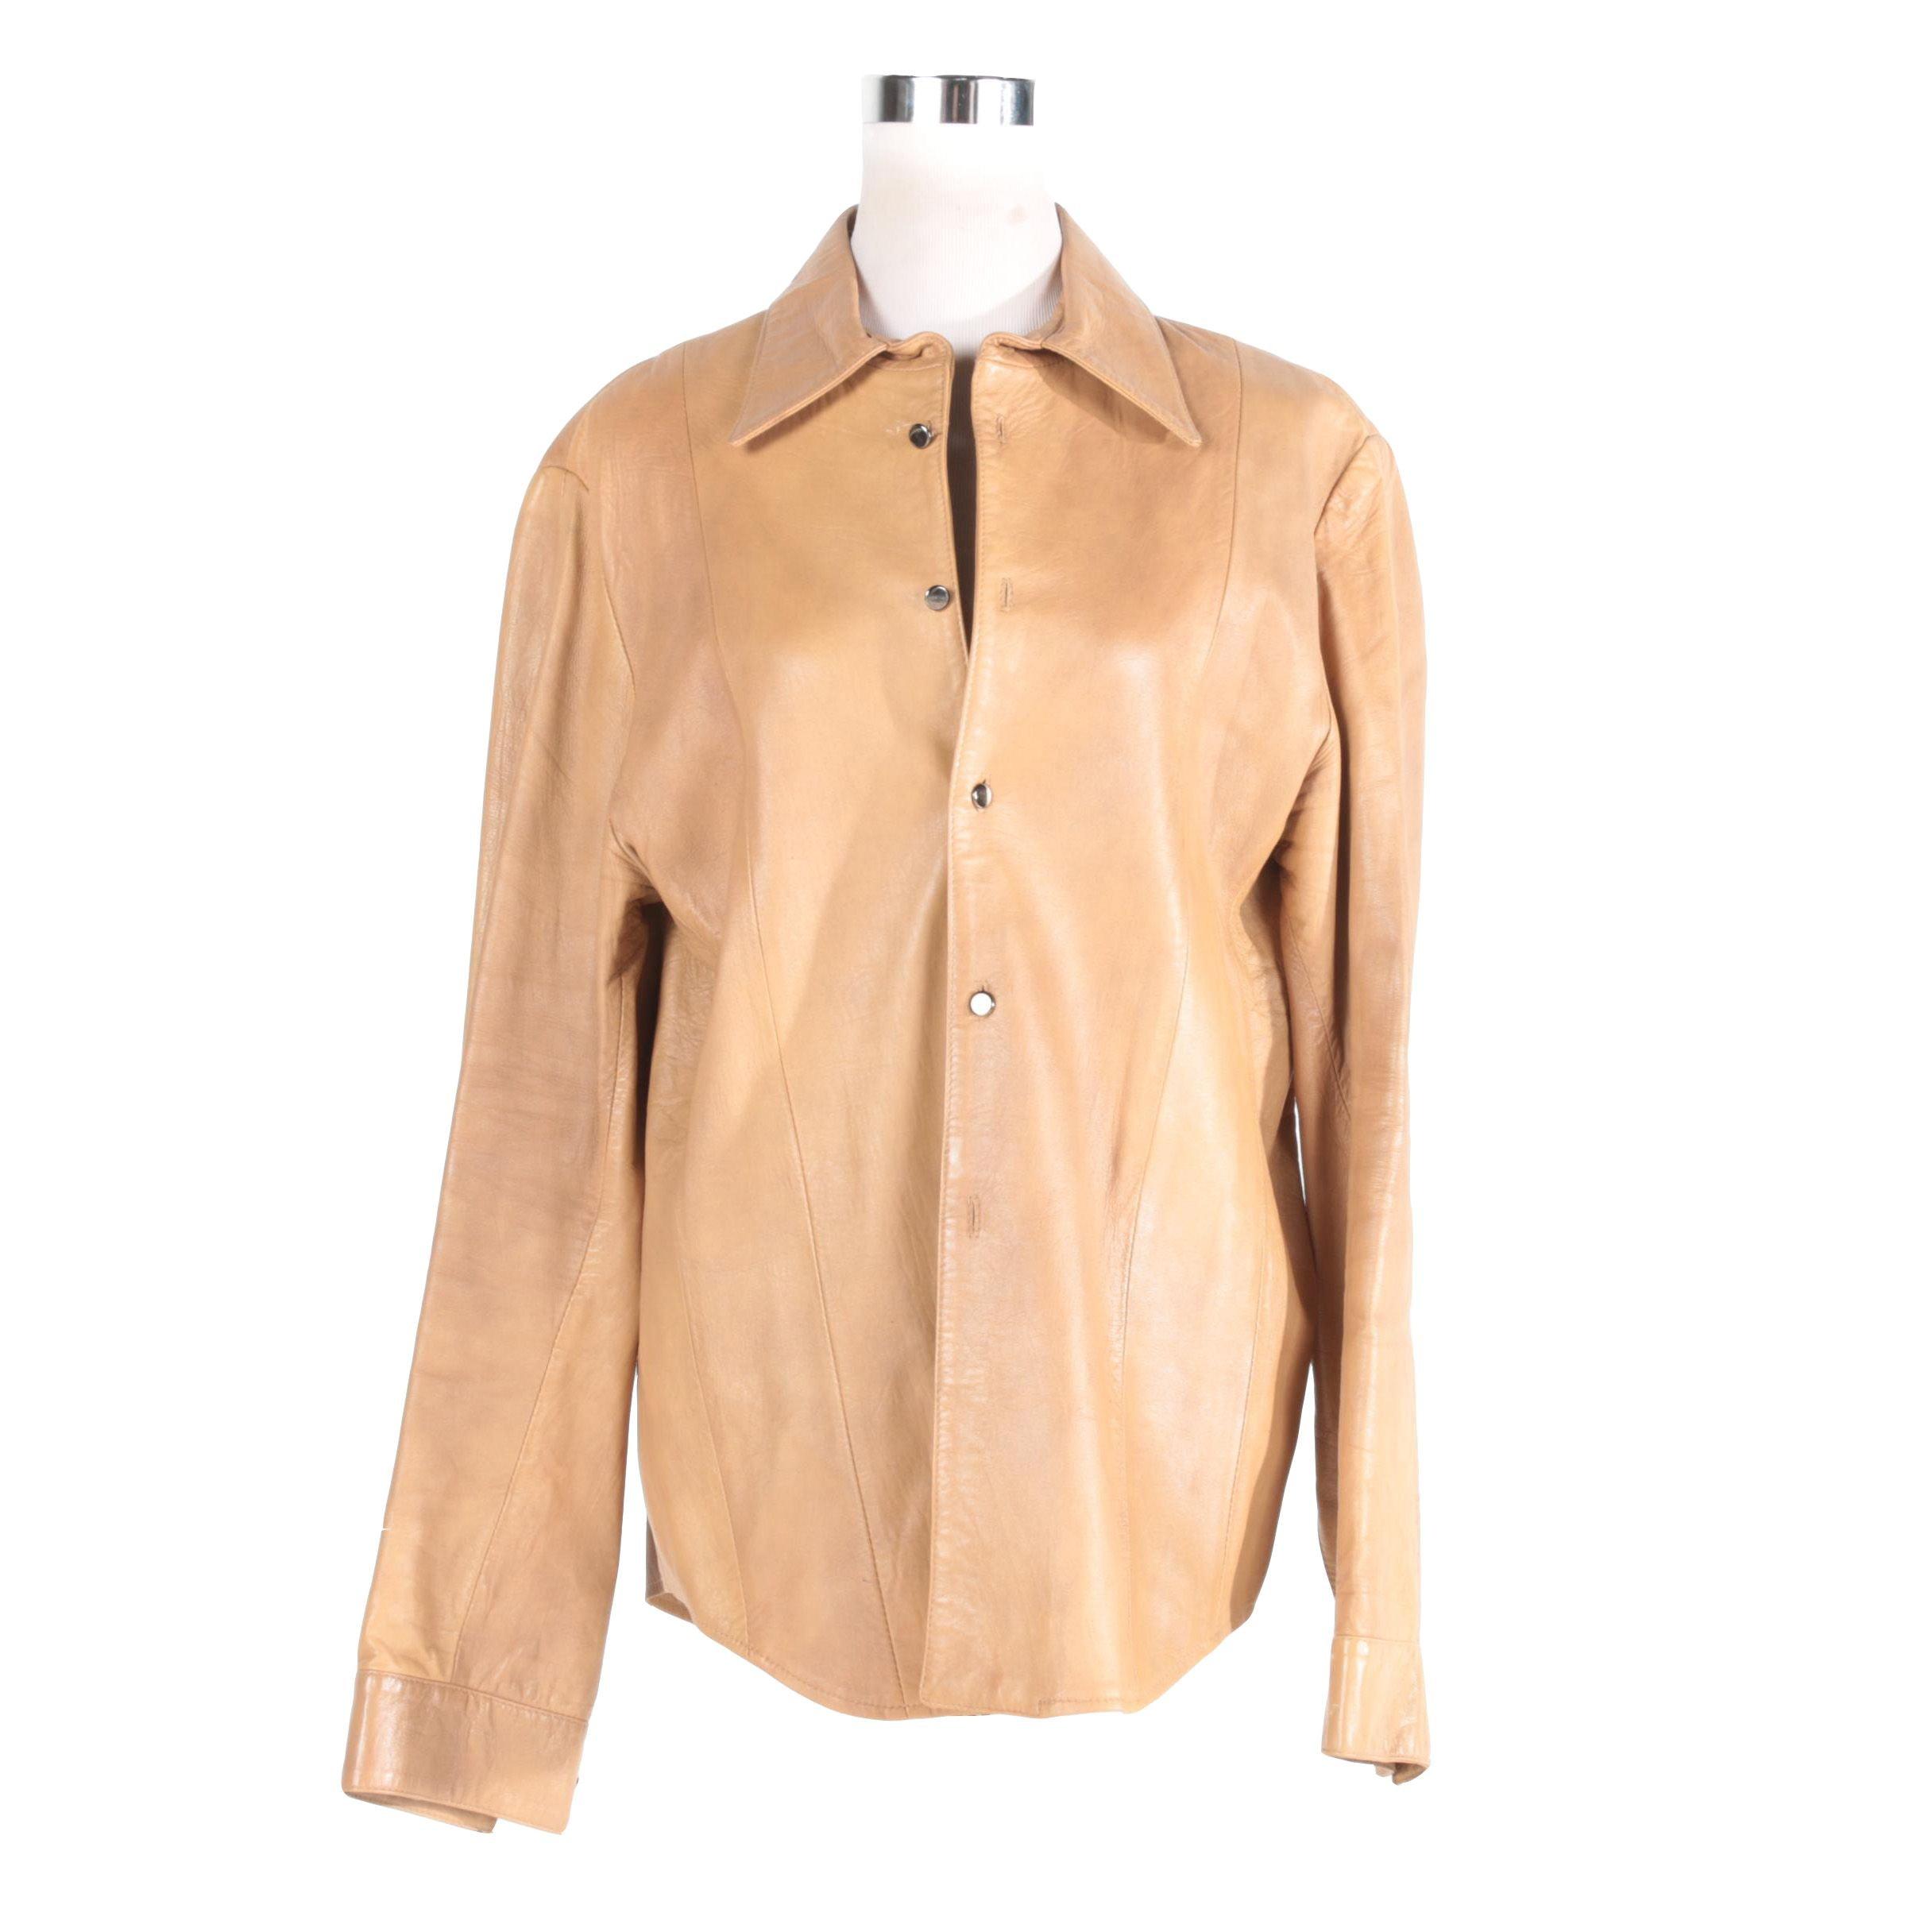 Men's Vaunt Leather Jacket